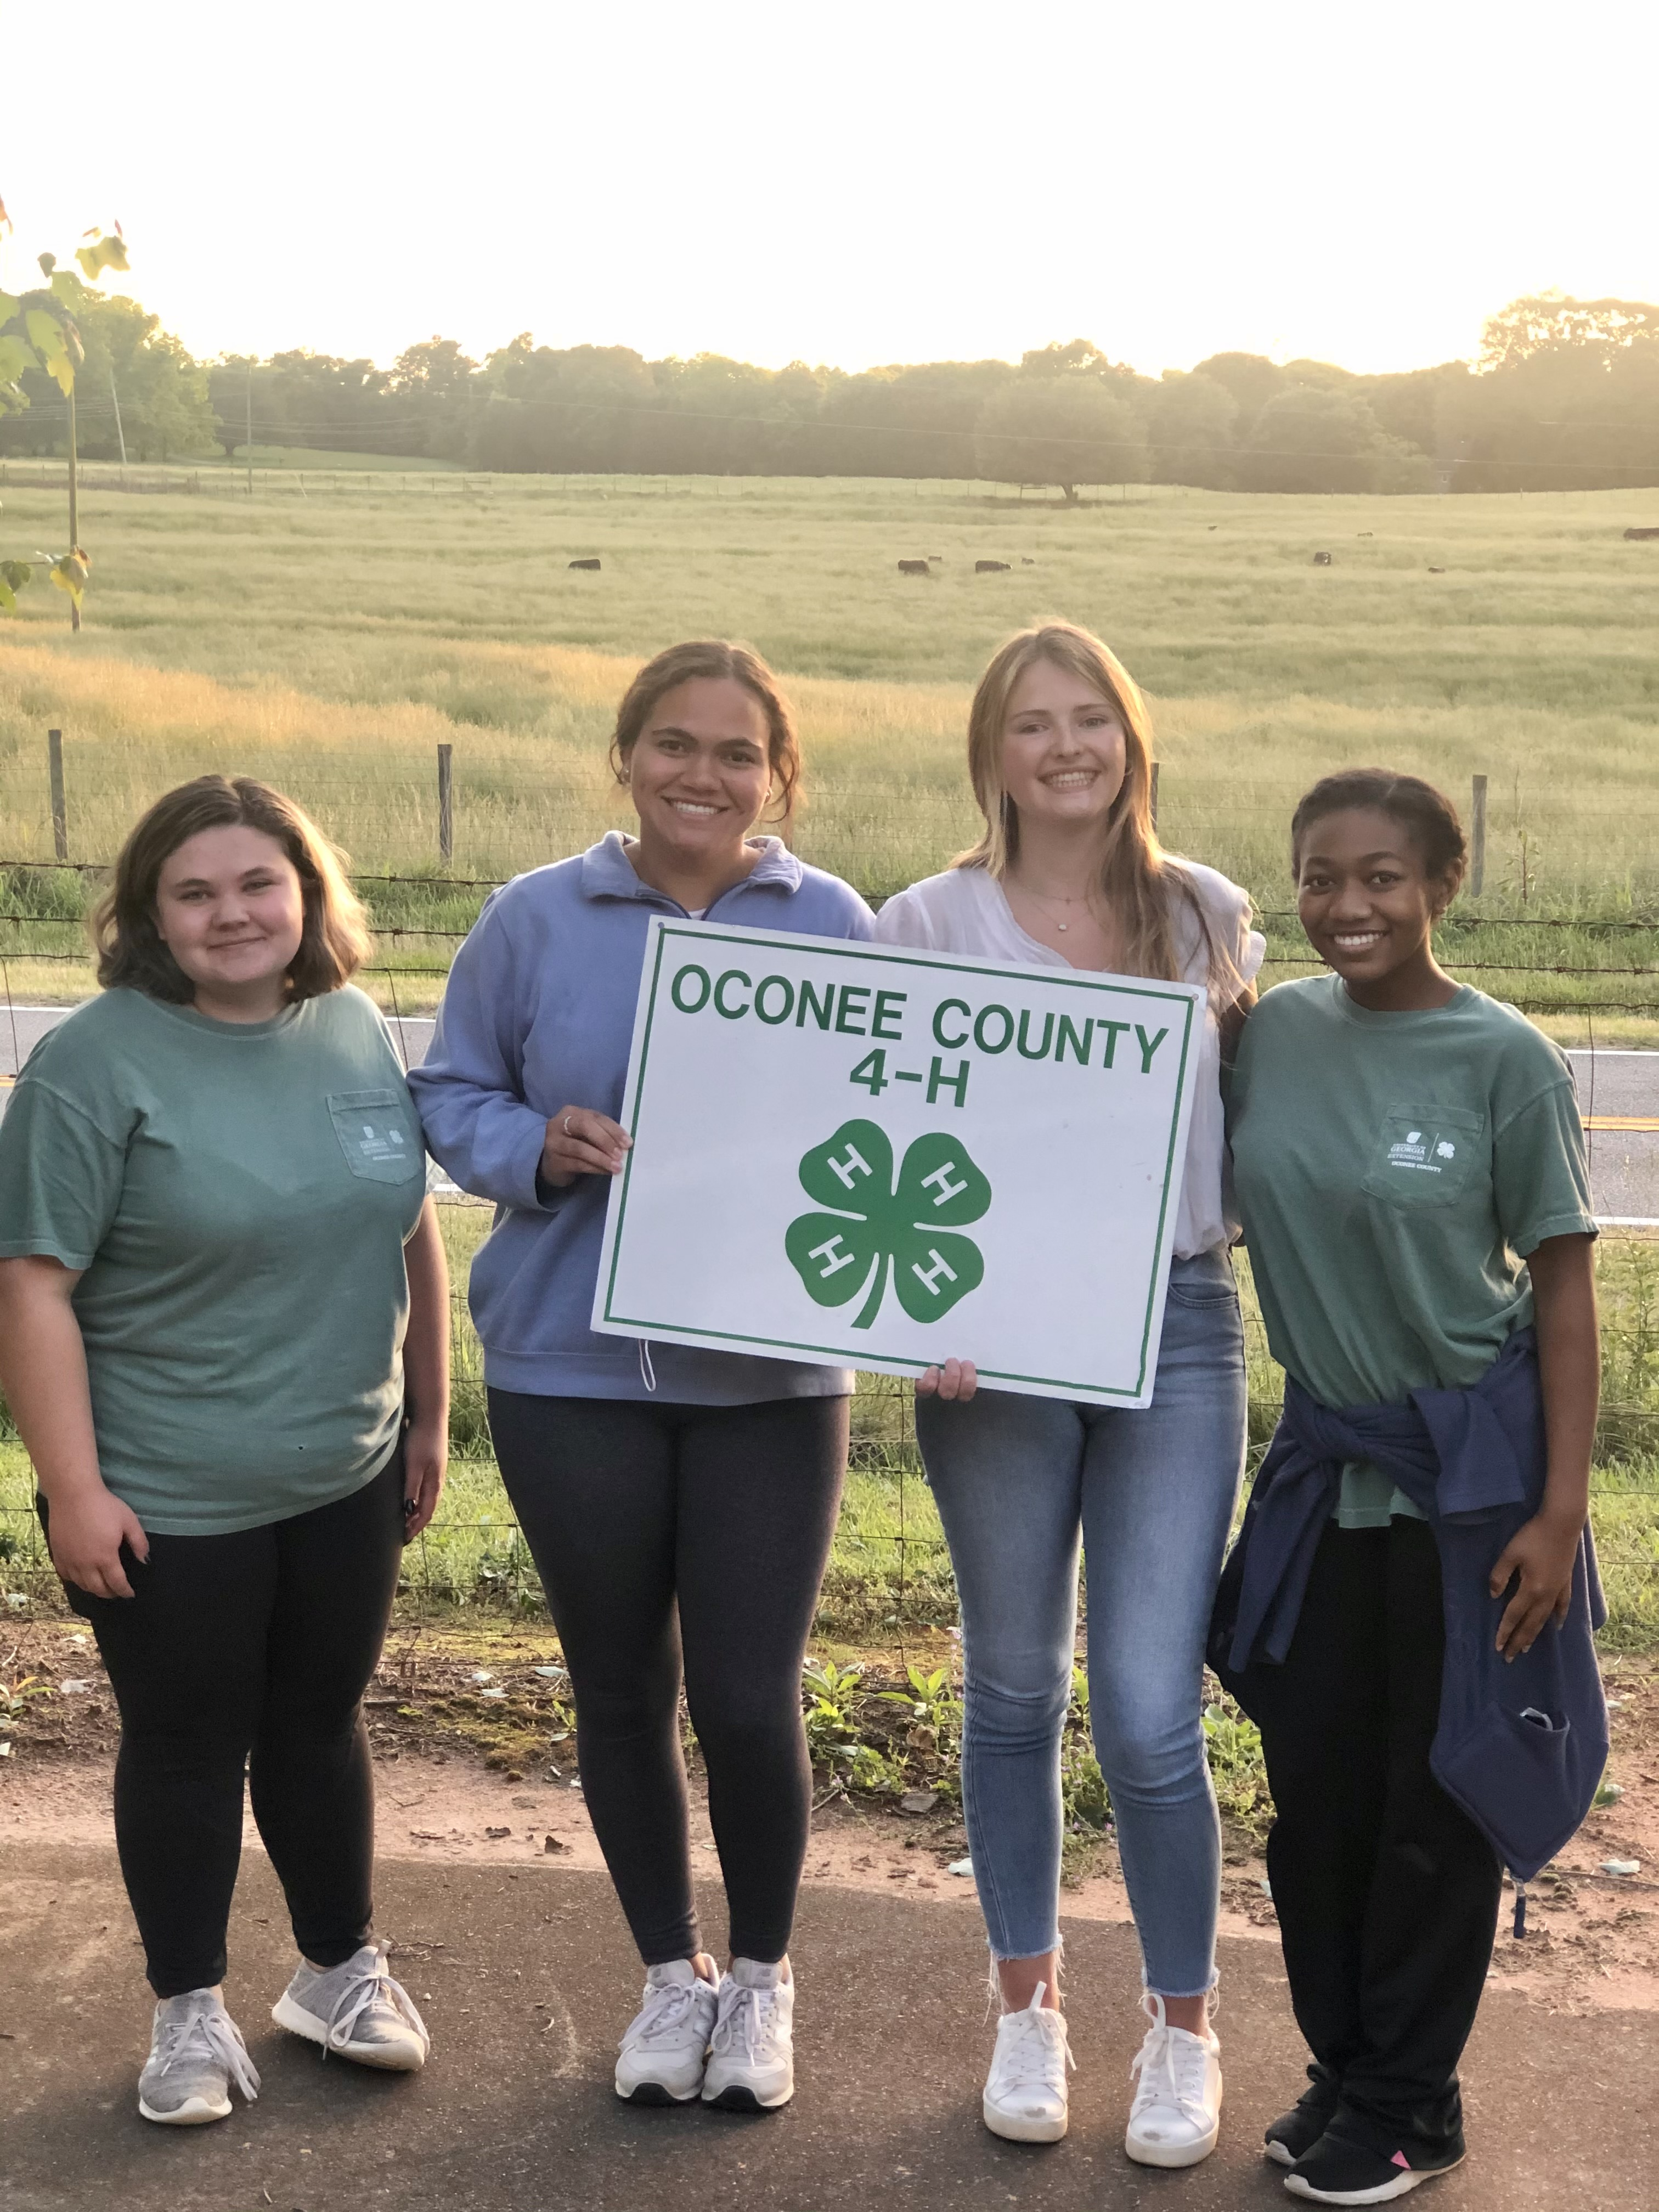 4-H Dairy Quiz Bowl senior first place team members Alicia Carnes, Alyssa Haag, Robie Lucas and Kalani Washington represented Oconee County's Team A.